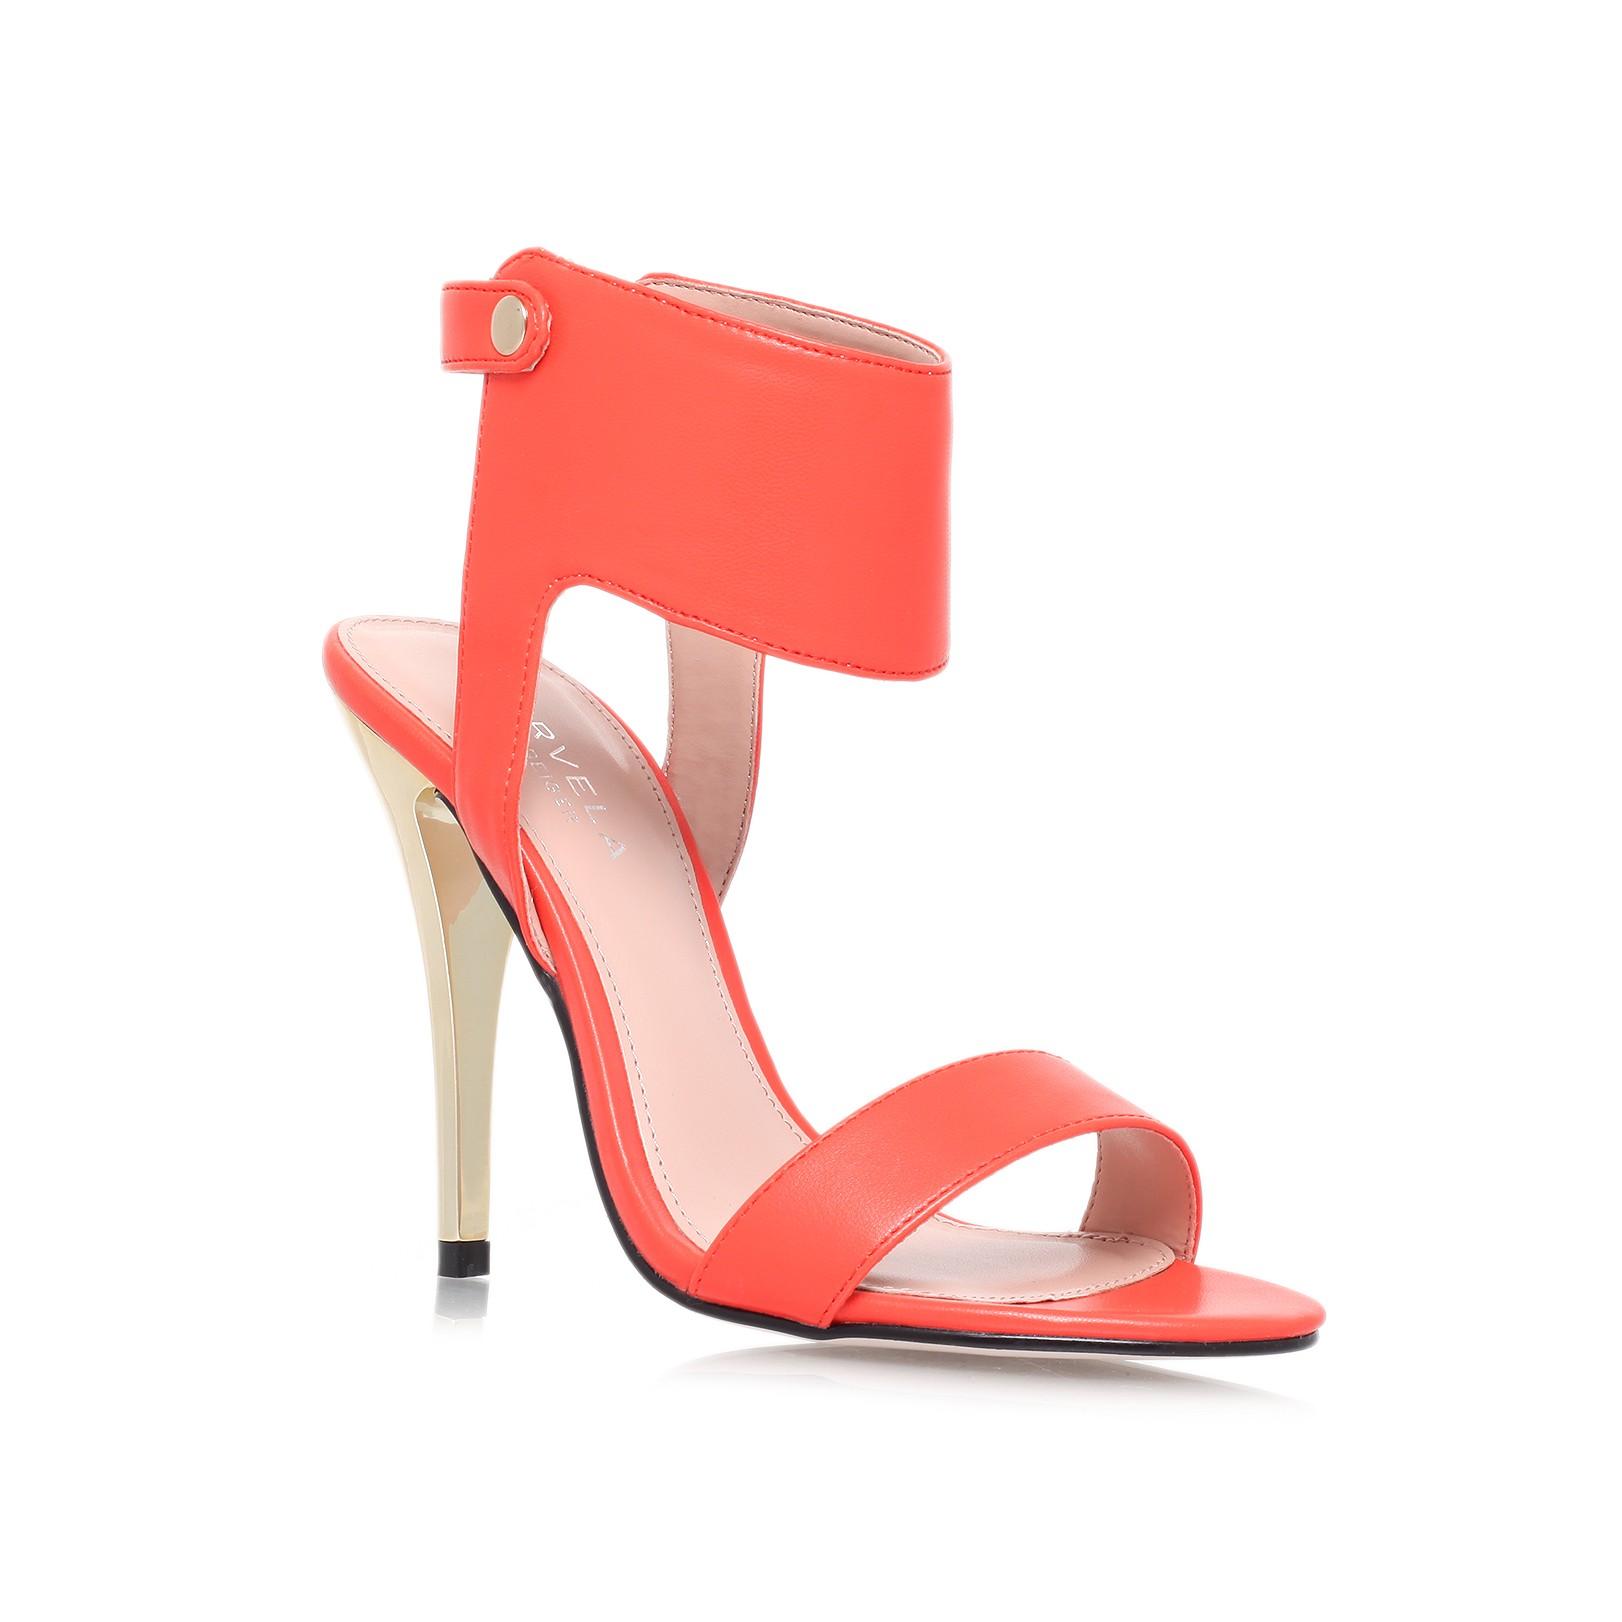 Kurt Geiger    JESSICA Orange High Heel Sandals by Carvela Kurt Geiger